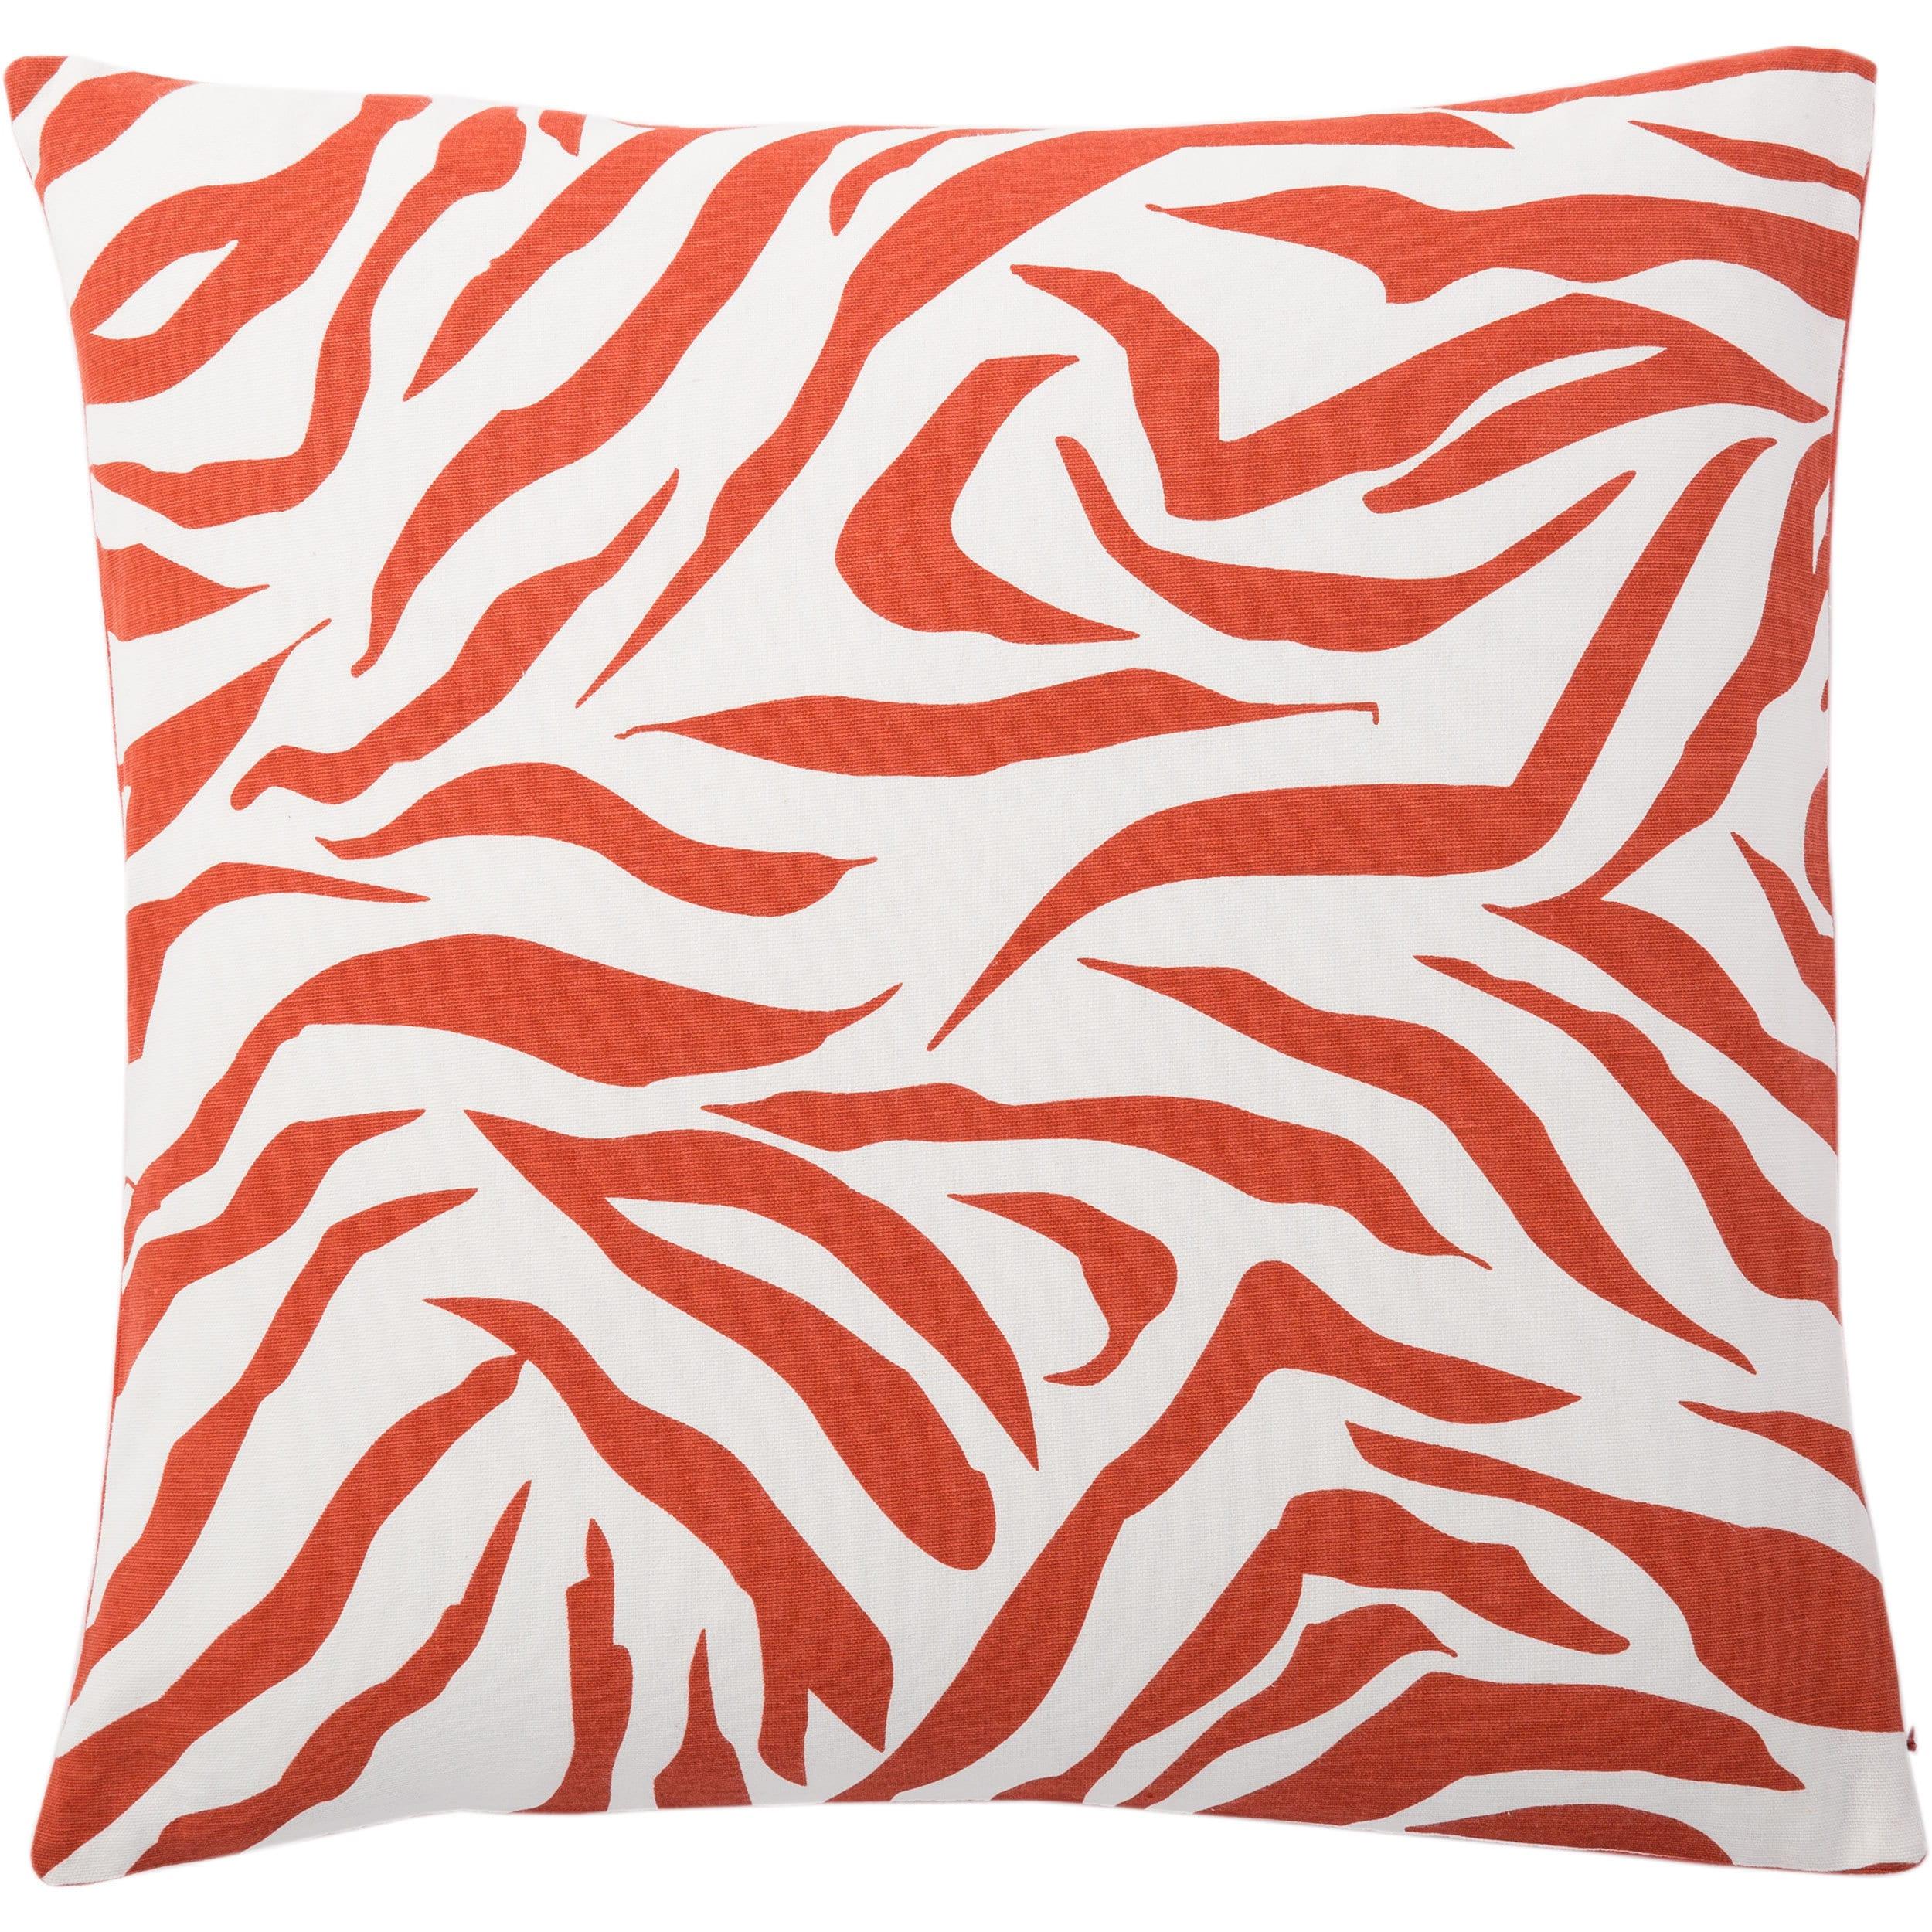 "Rizzy Home Decorative Poly Filled Throw Pillow Zebra Print 20""X20"" Orange"